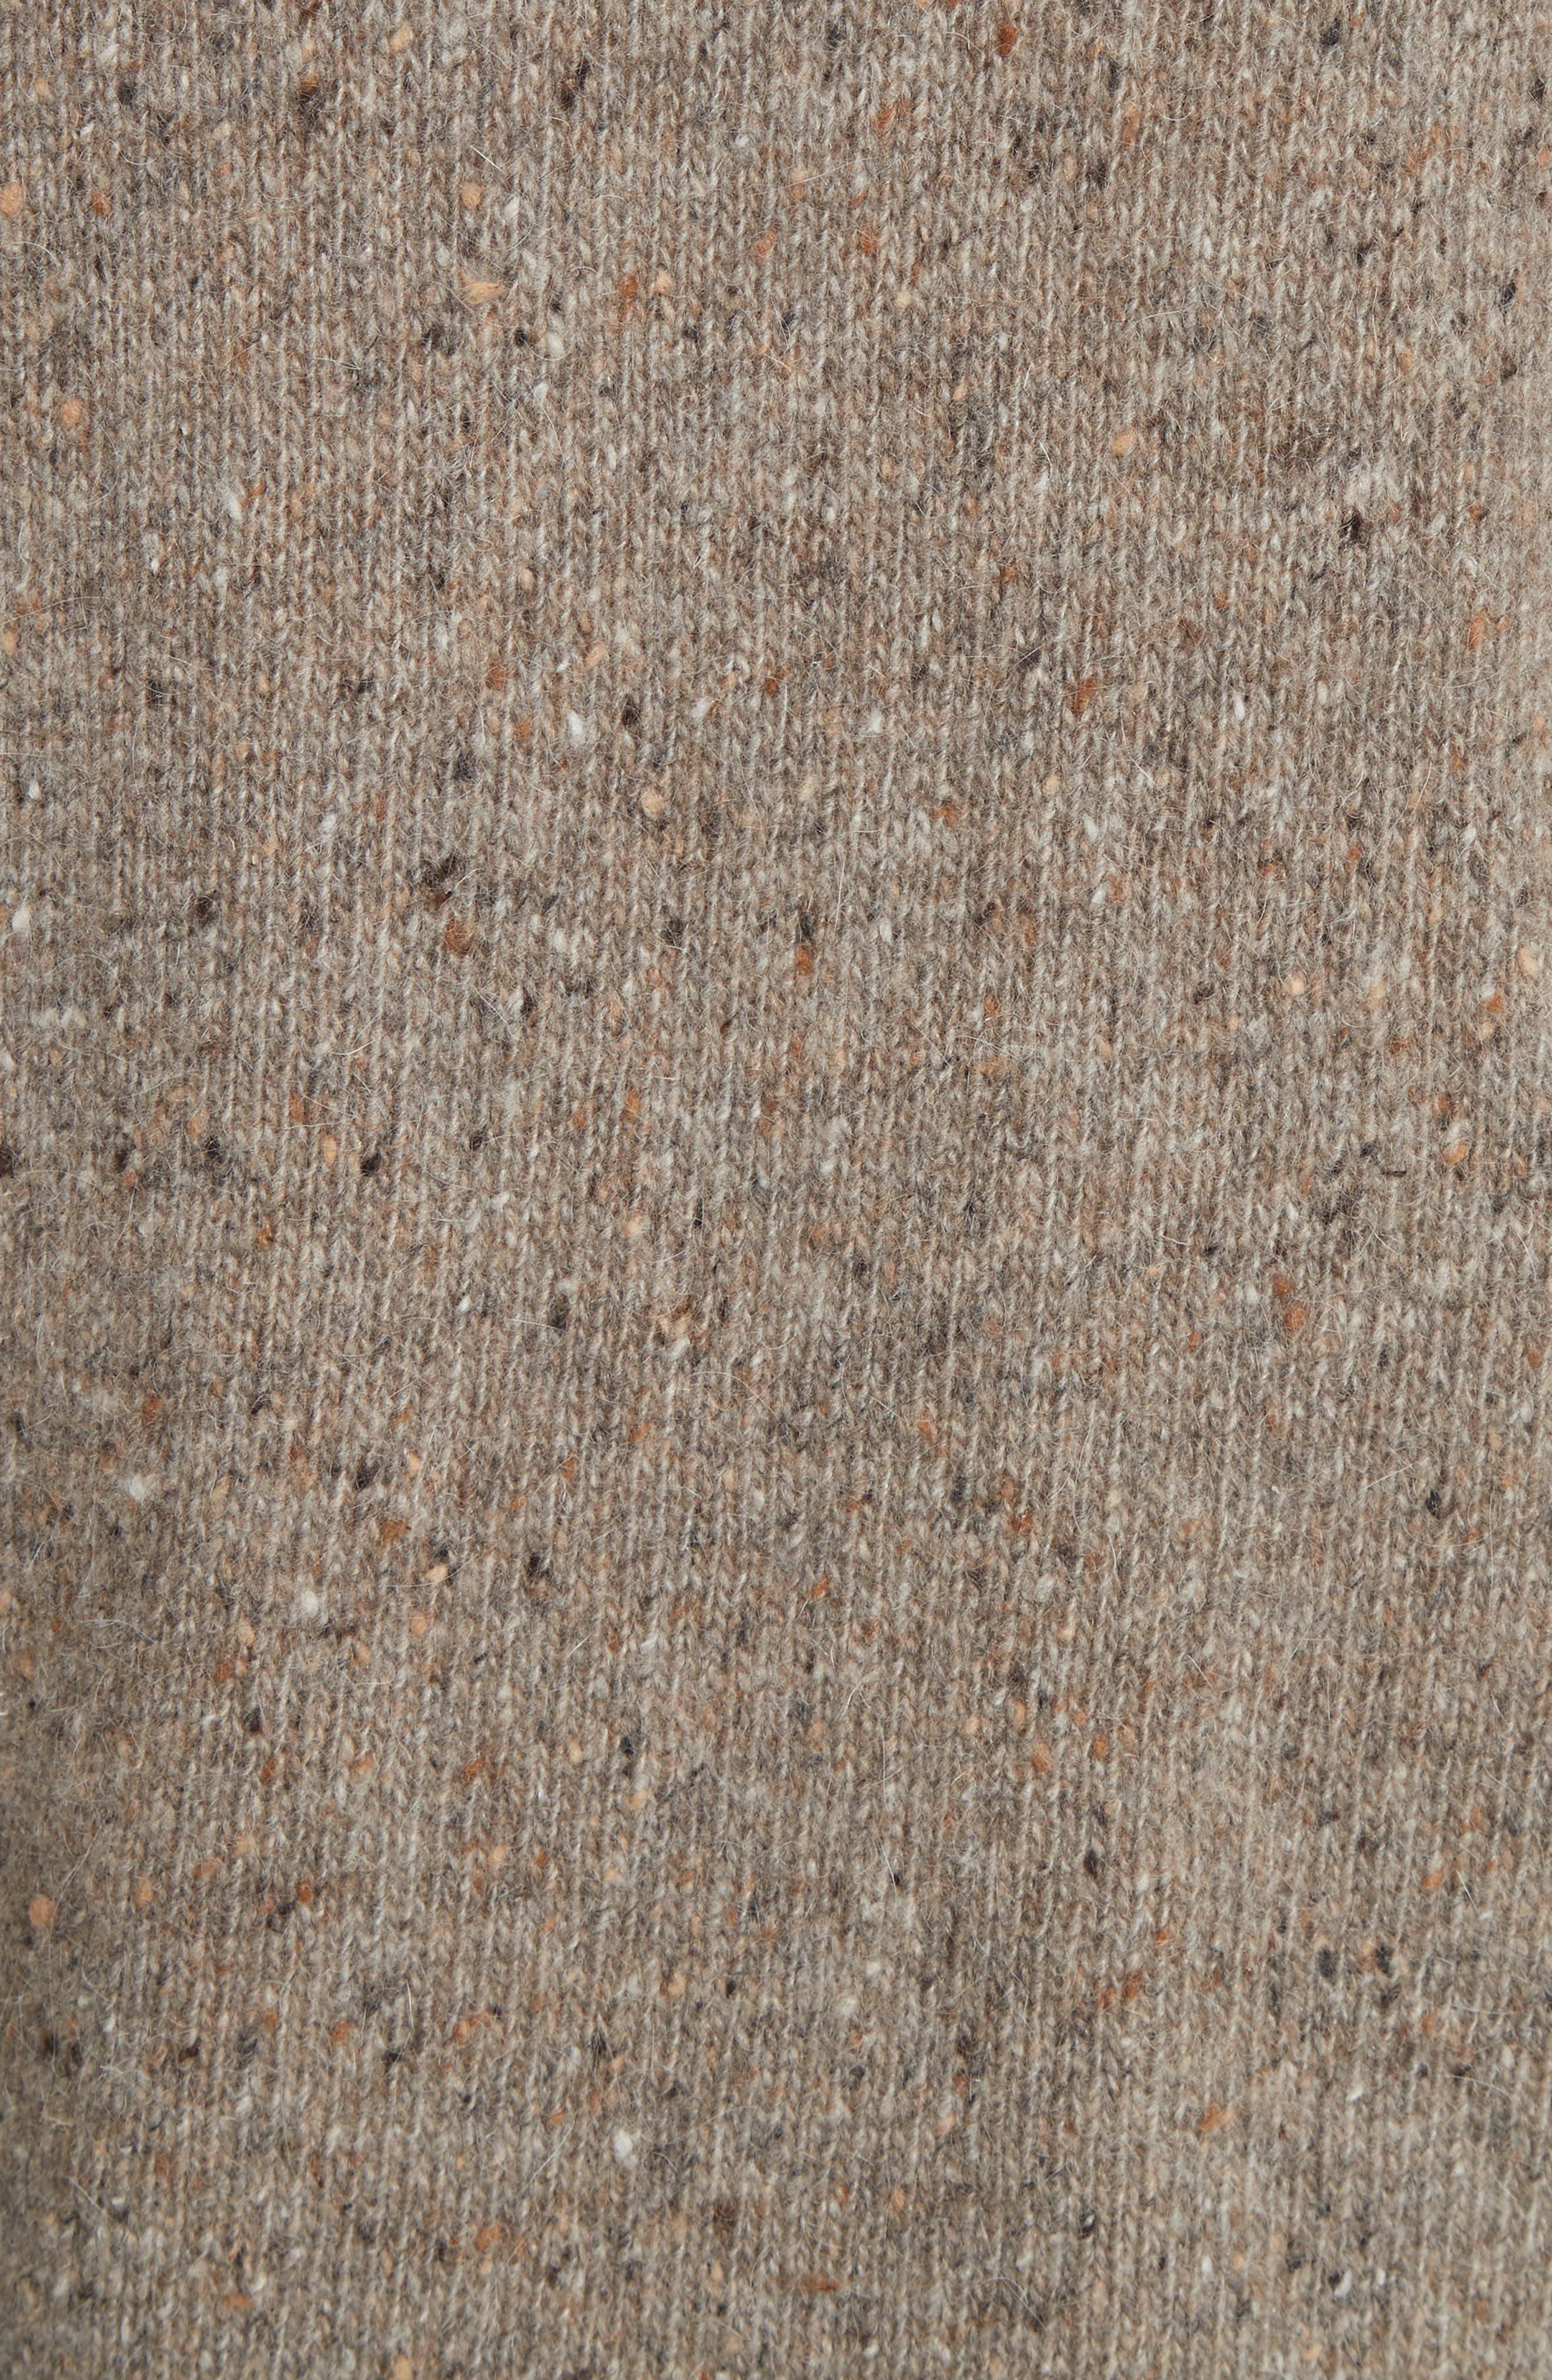 Cashmere Turtleneck Sweater,                             Alternate thumbnail 10, color,